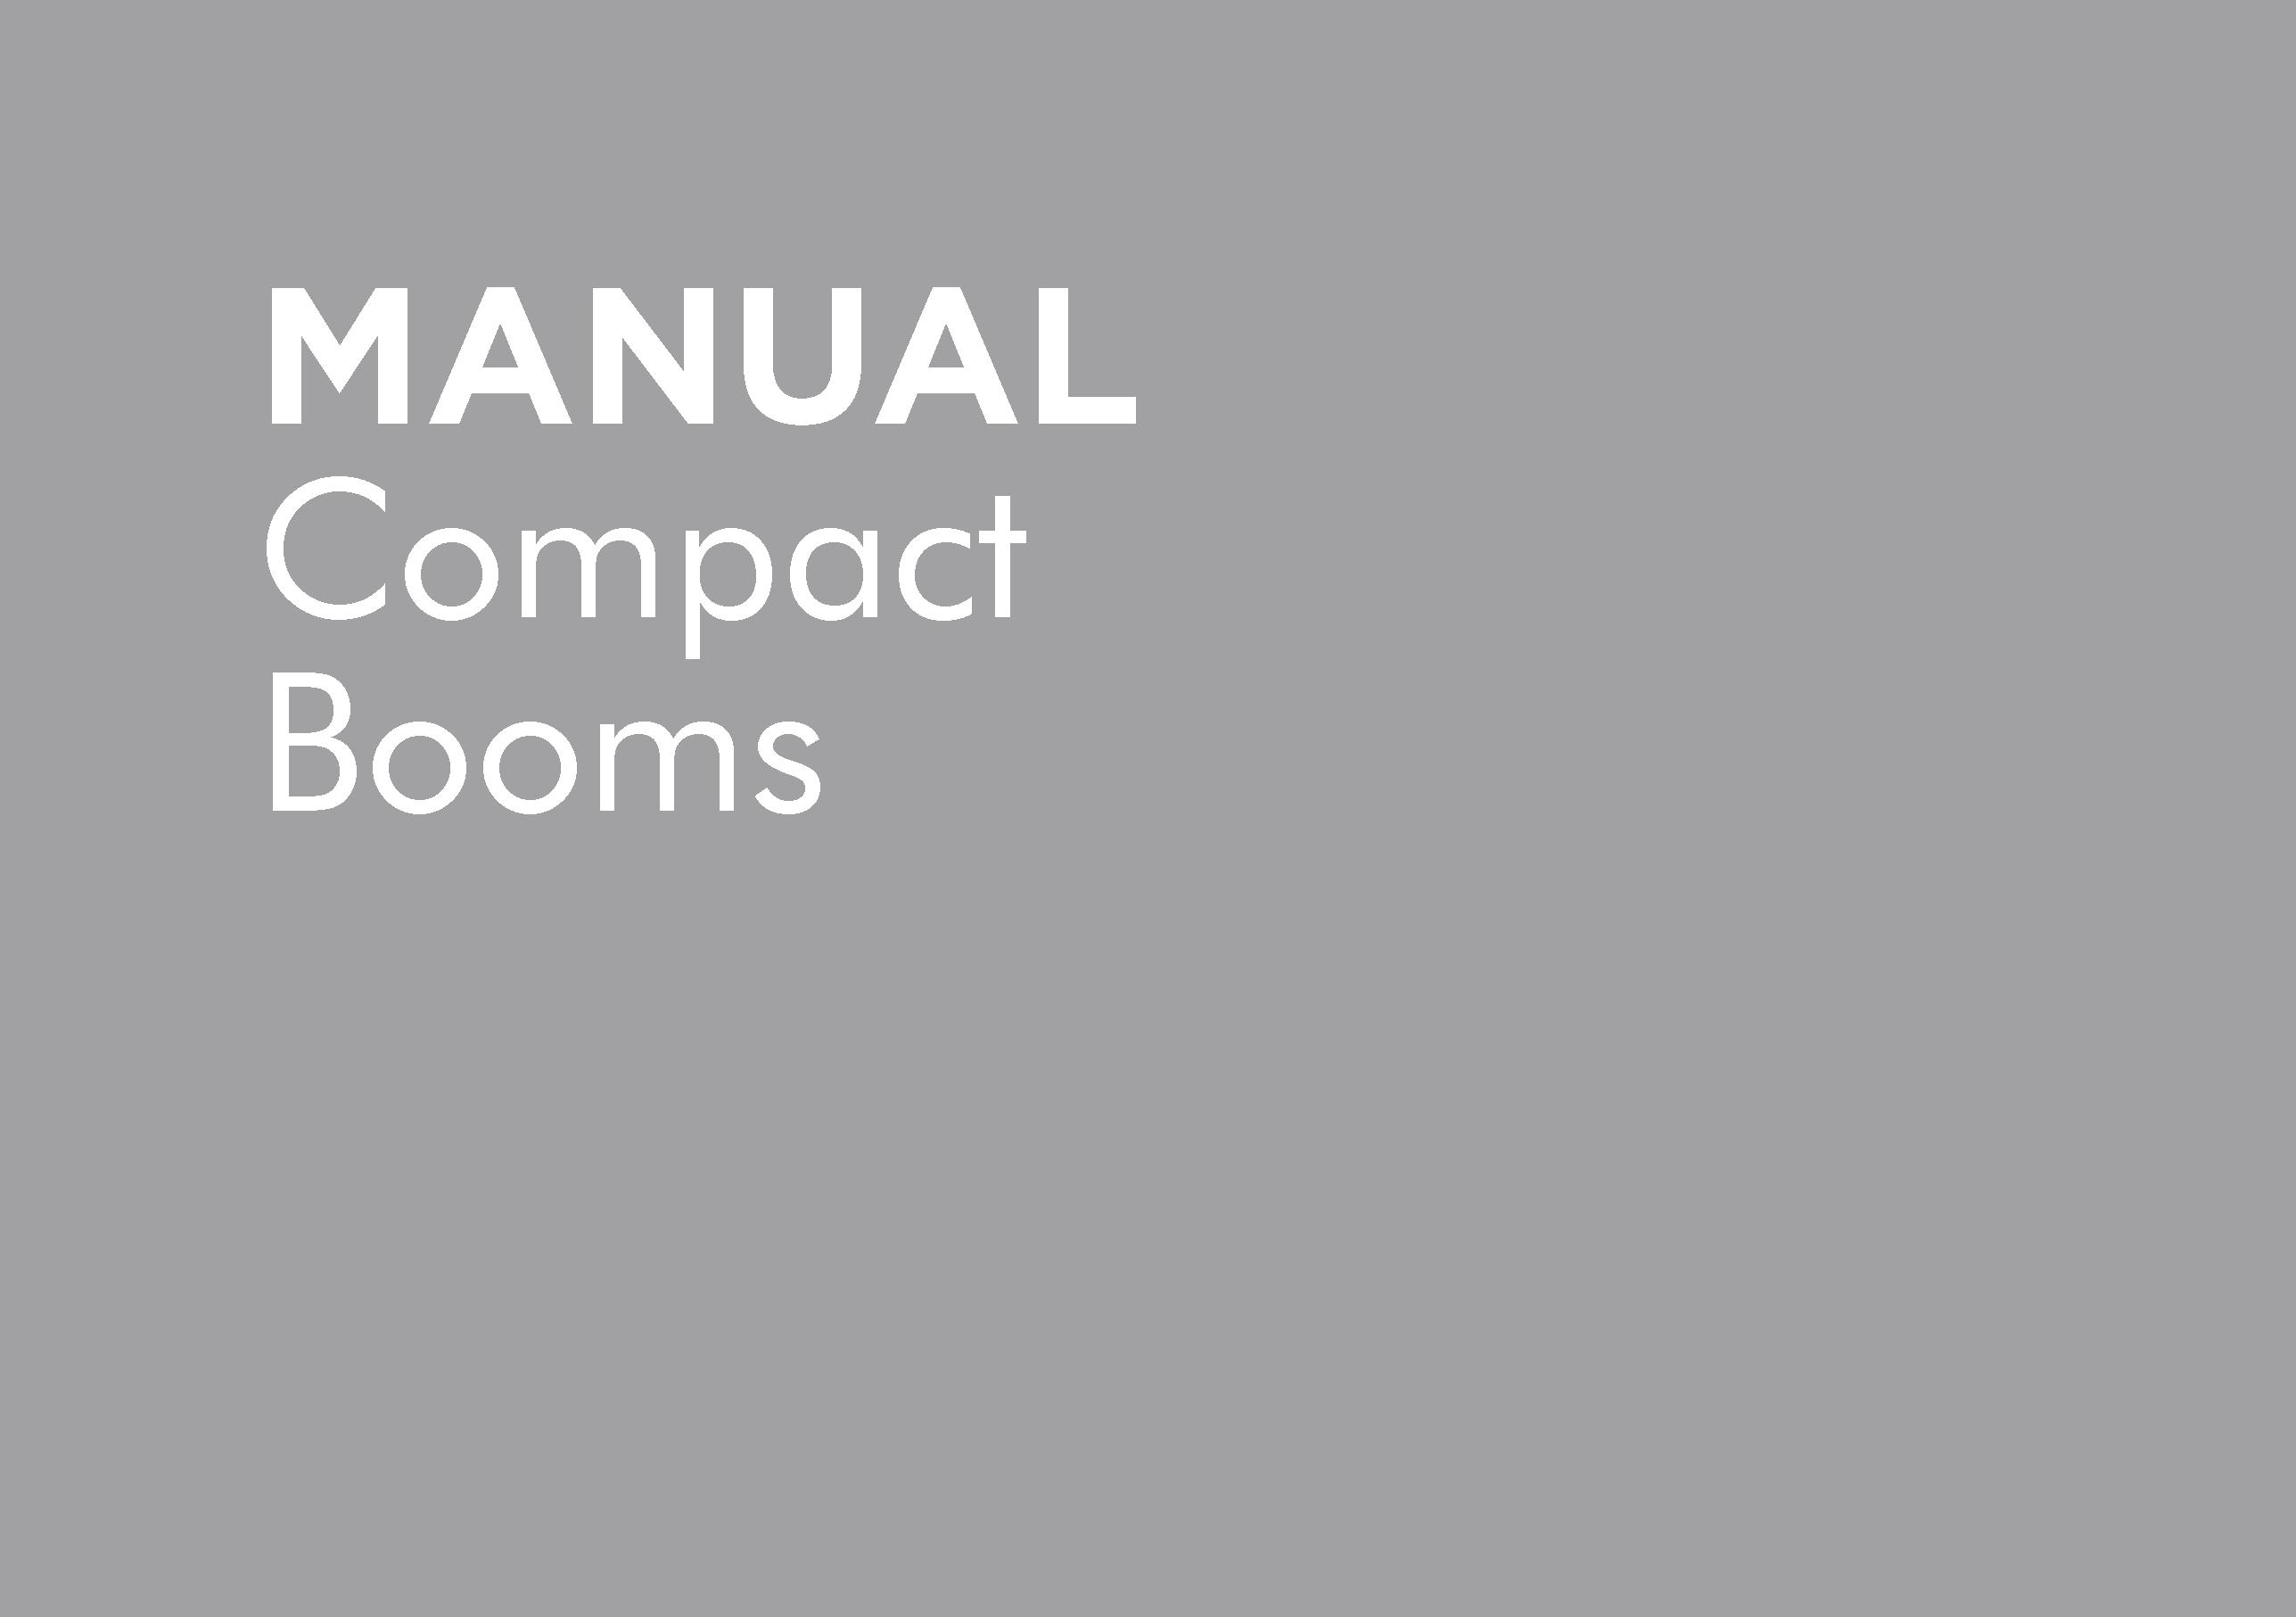 GP-OMOBOOM-A – OPTIMA BOOM MANUAL (WEB)